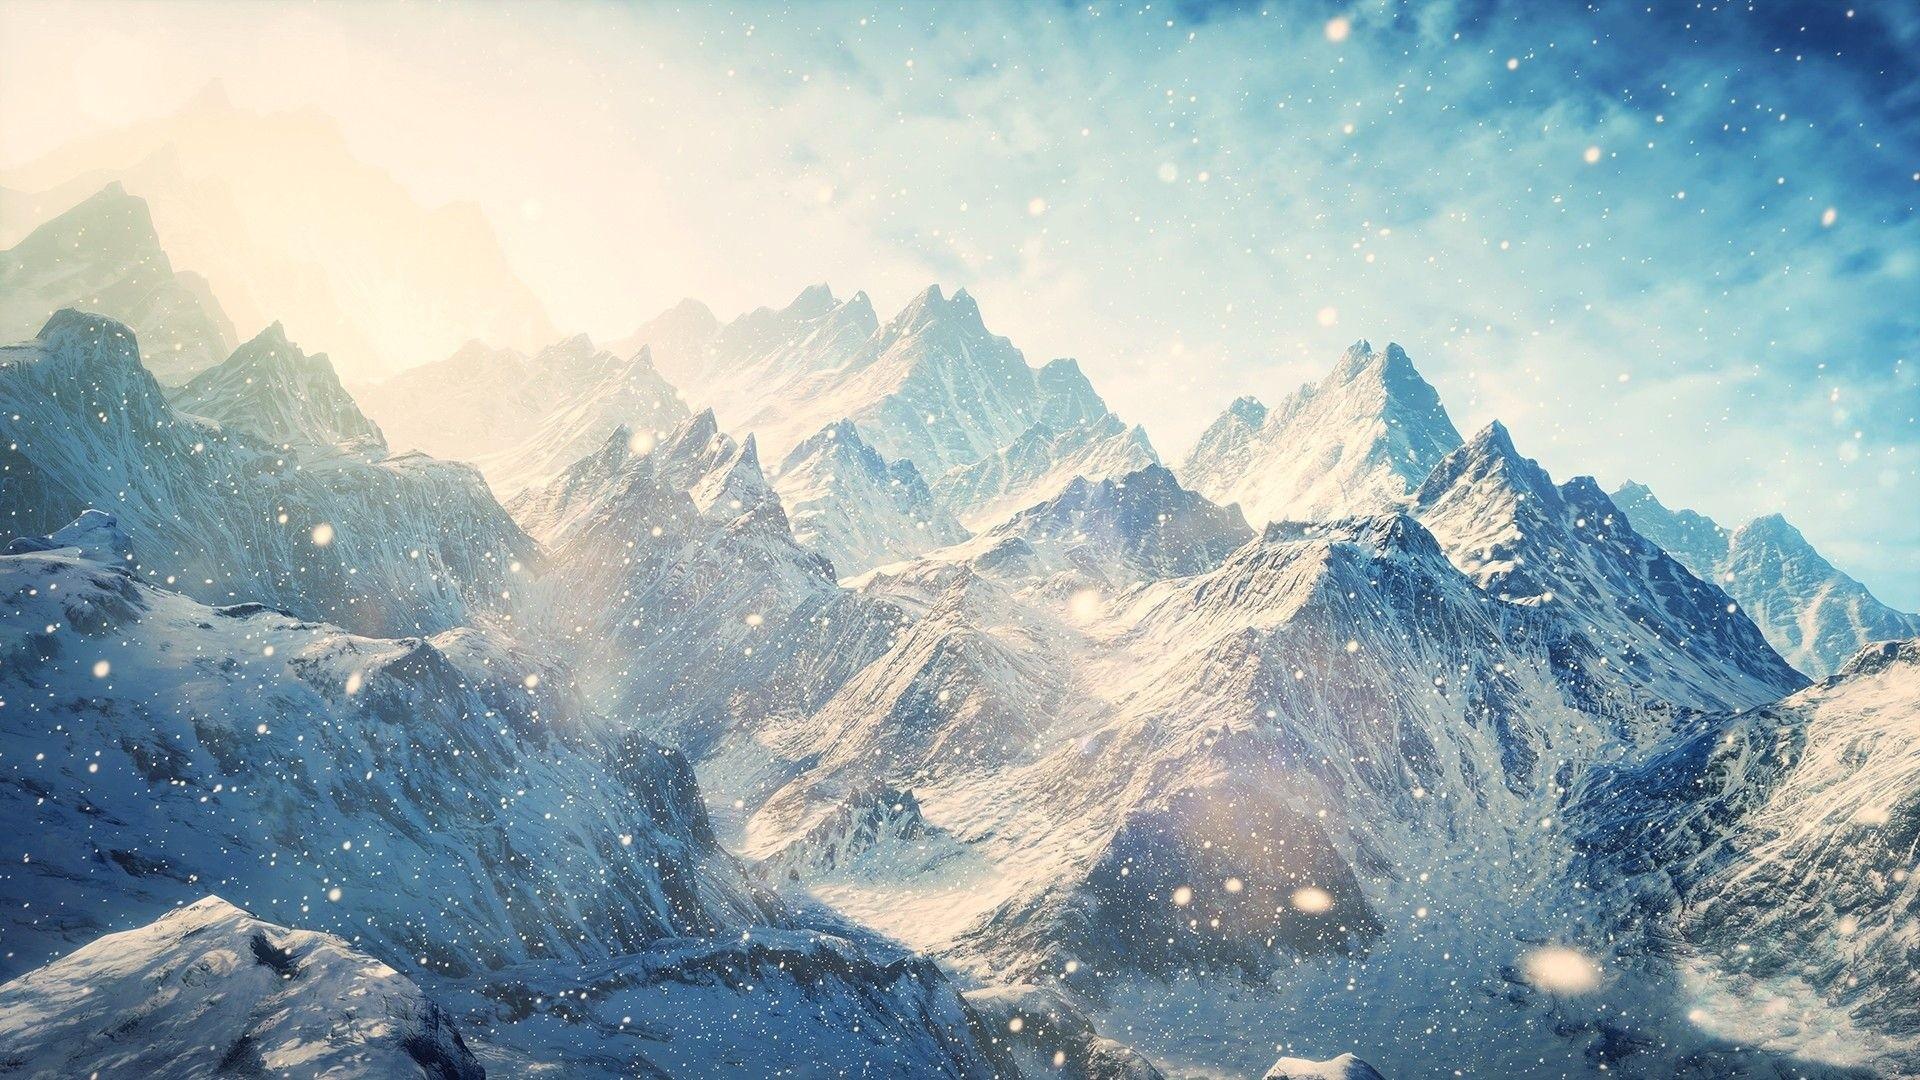 … Background Full HD 1080p. Wallpaper skyrim, mountains,  winter, snow, shine, glare